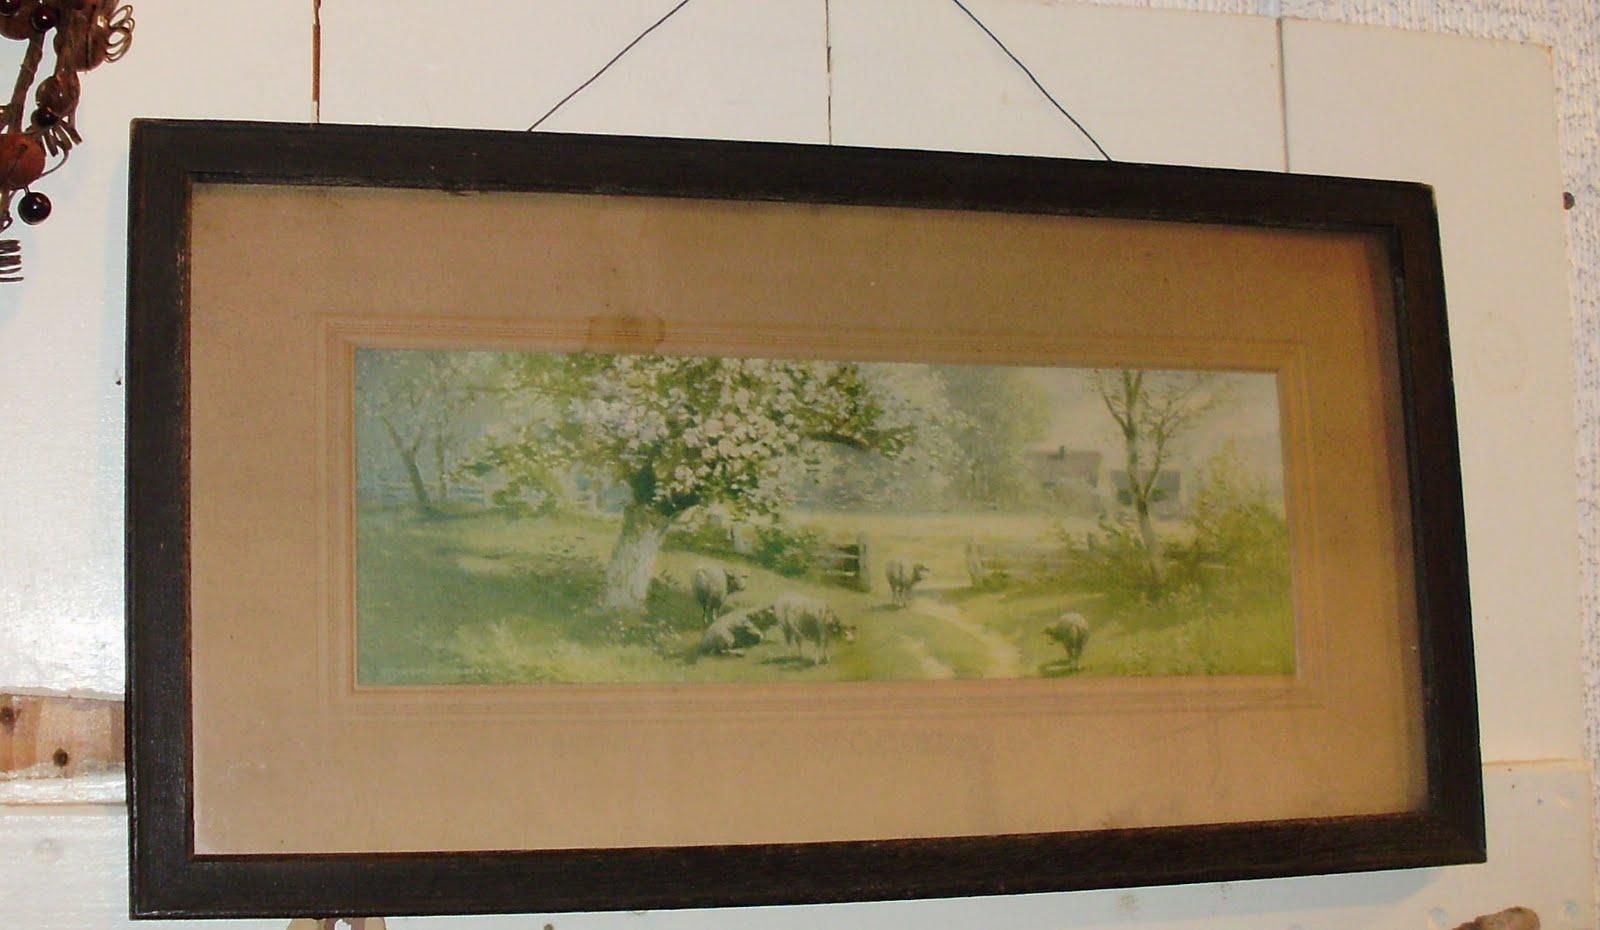 atkinson fox print